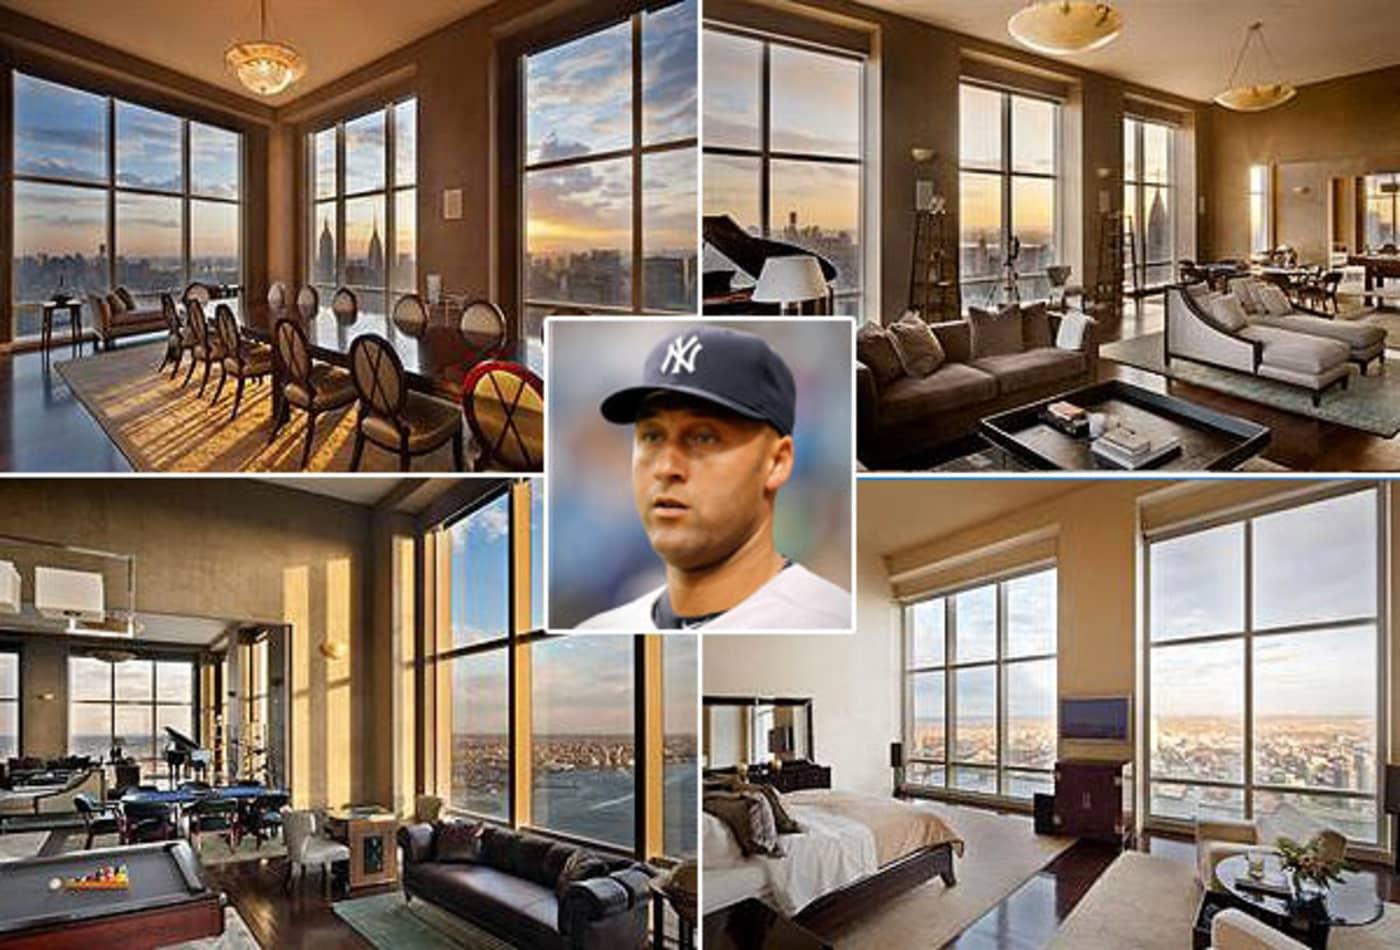 Derek-Jeter-Baseball-Homes-CNBC.jpg